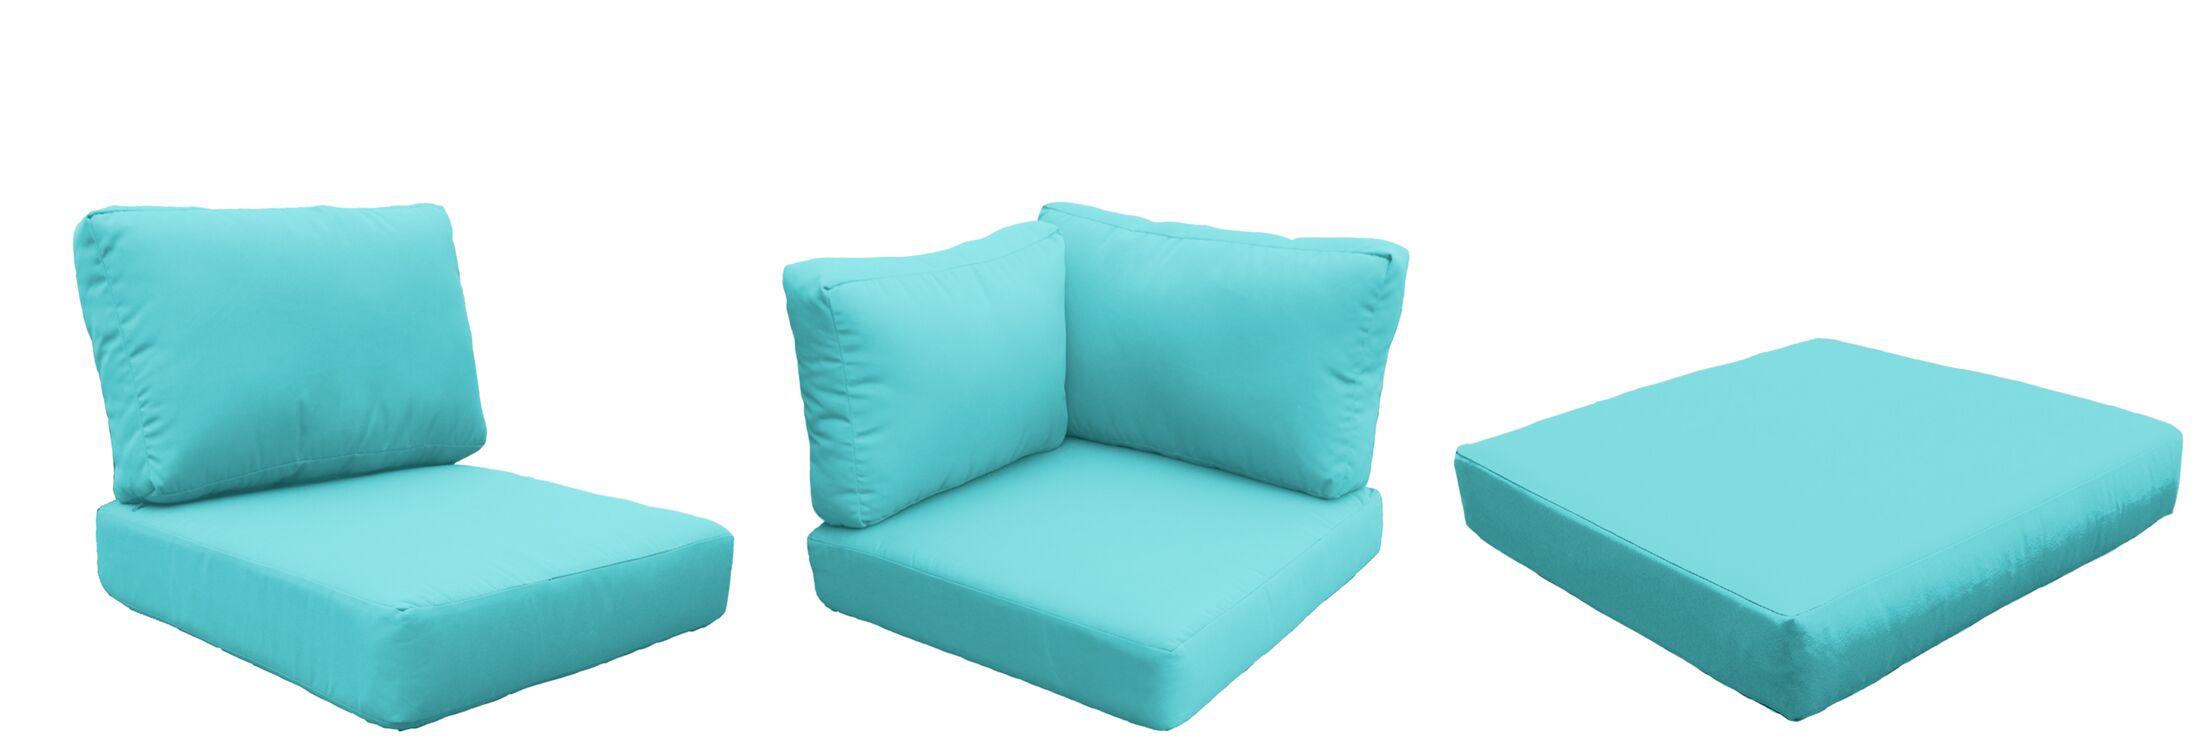 Coast Outdoor Replacement Cushion Set Fabric: Aruba